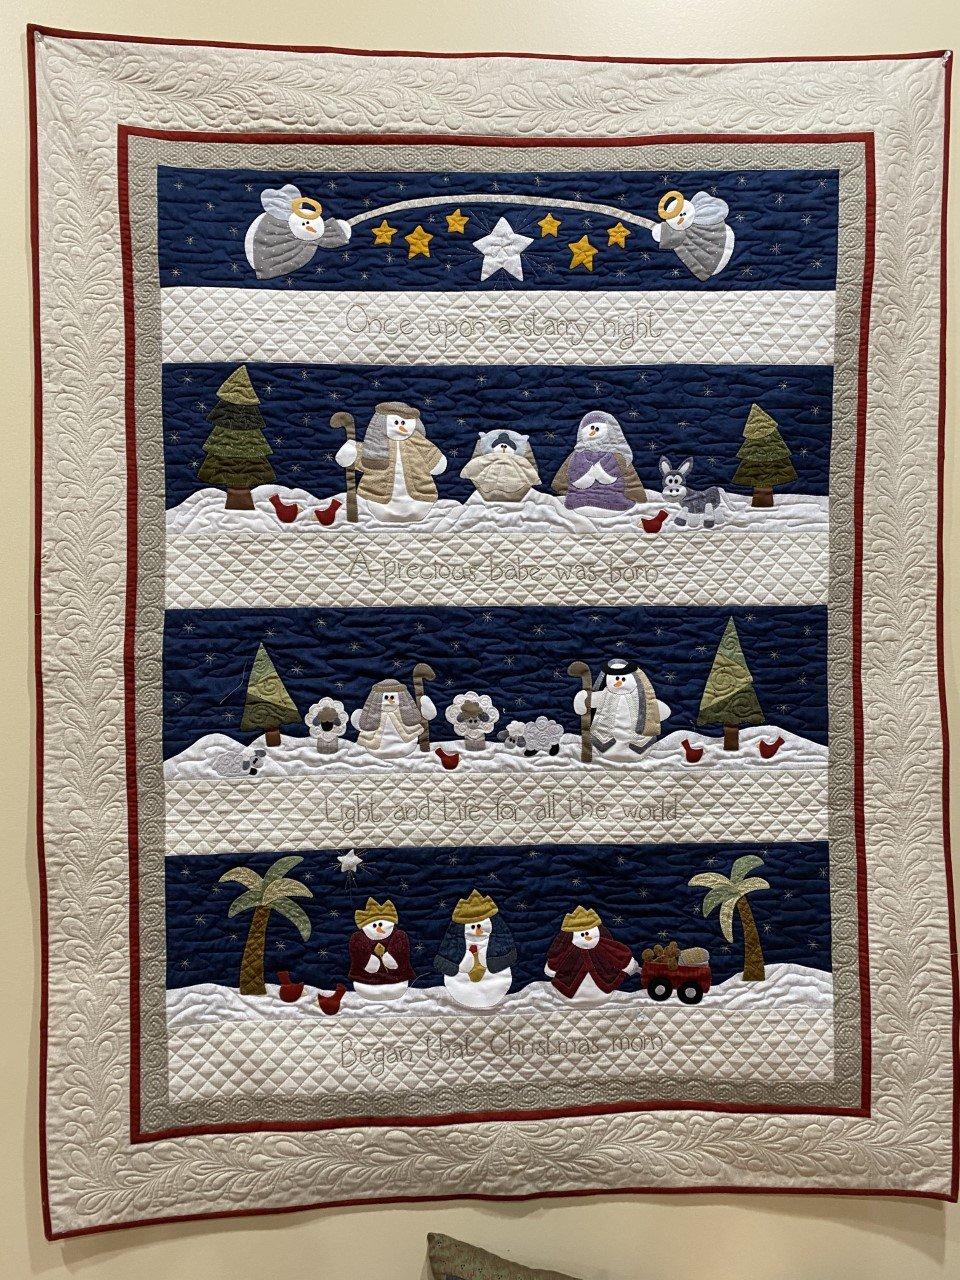 Snowman Nativity Quilt Kit